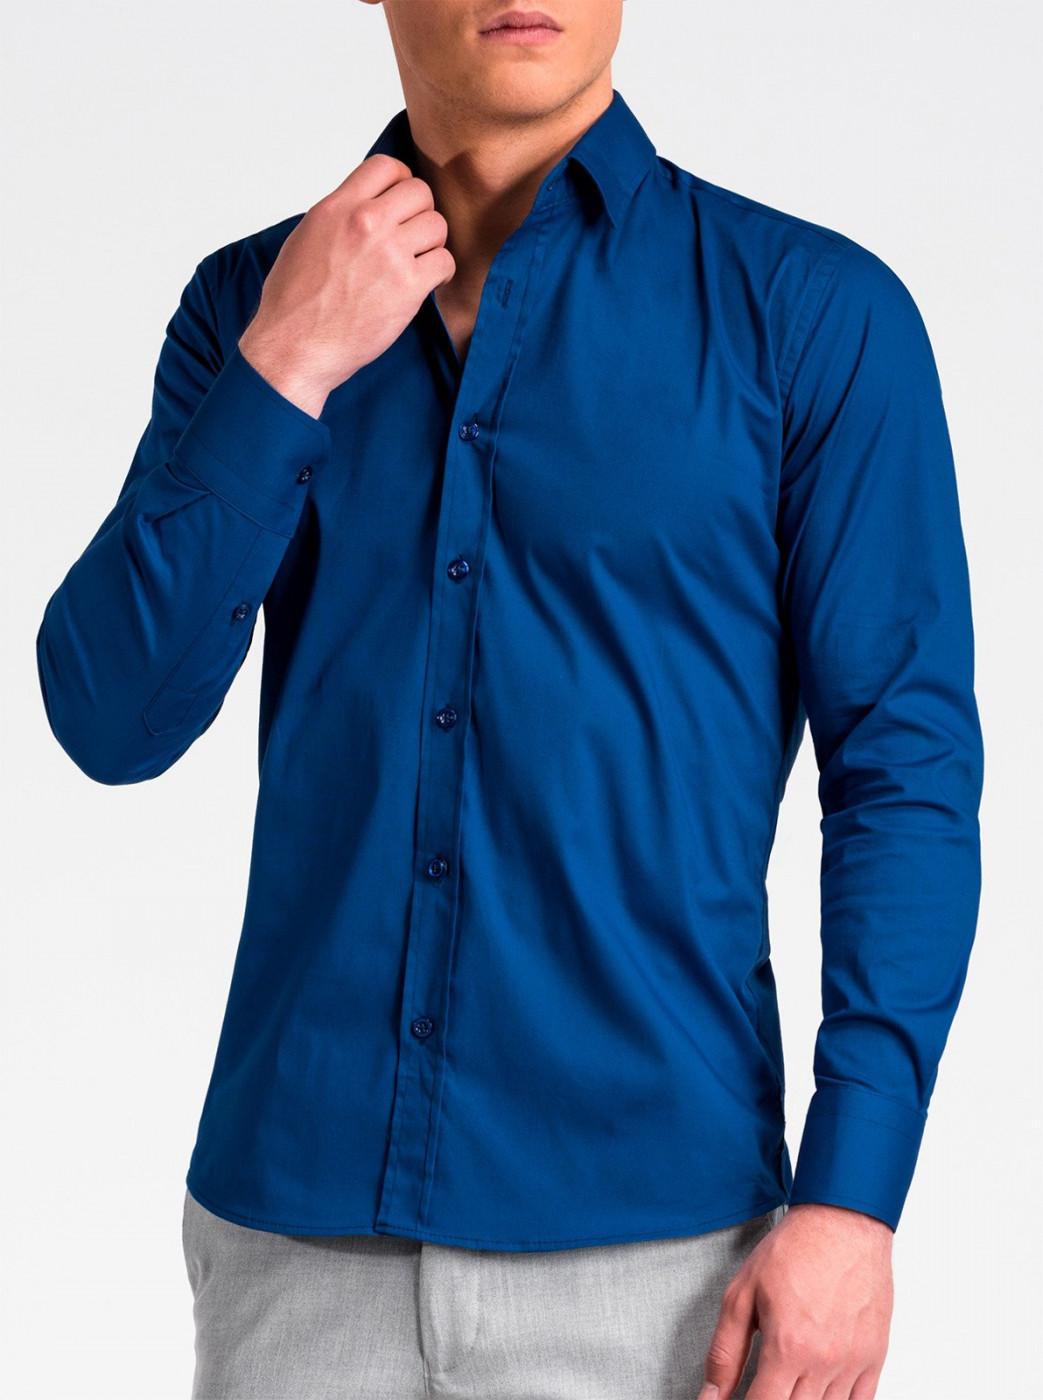 Men's shirt Ombre Slim fit